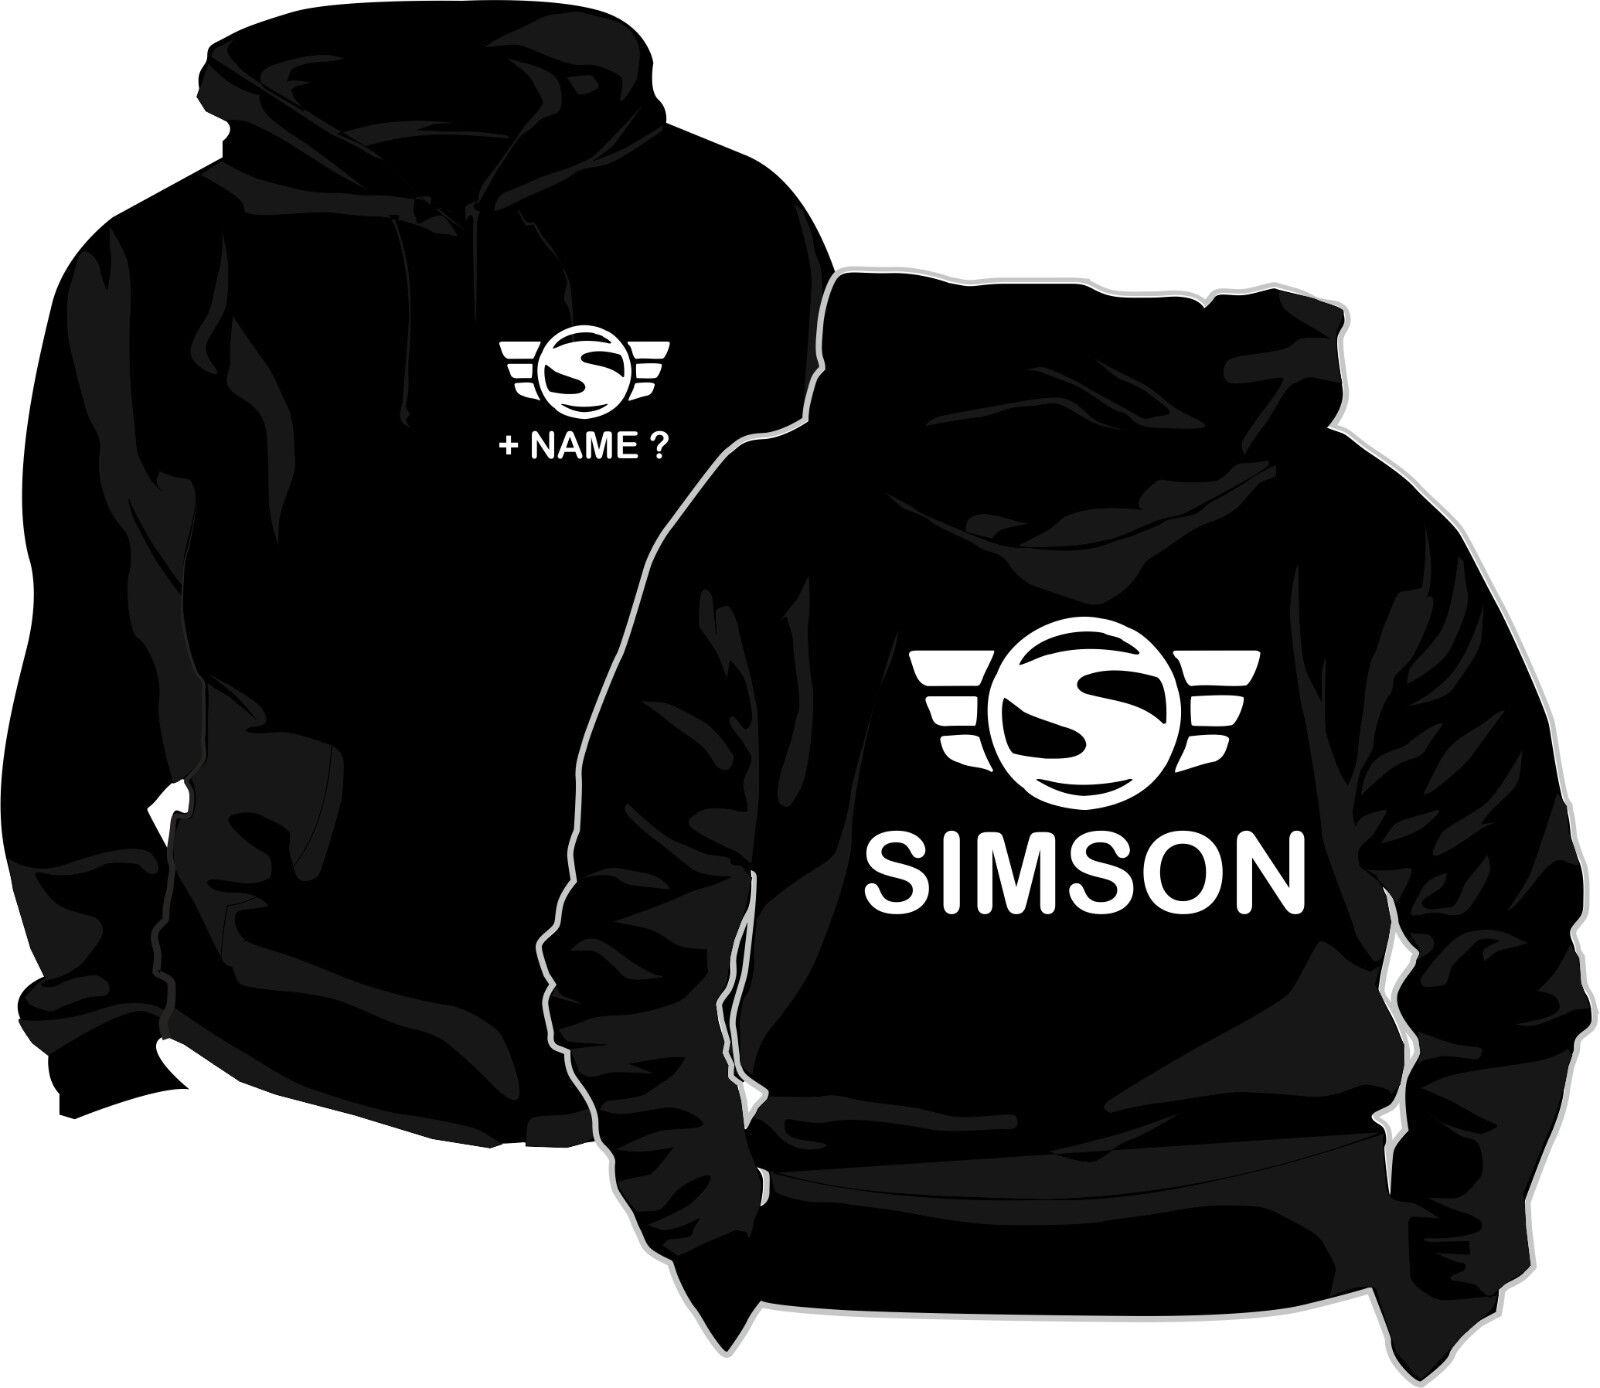 Simson Kapuzenpullover Kapuzen Pullover Logo Wunschname Kulturerbe Kultshirt 33